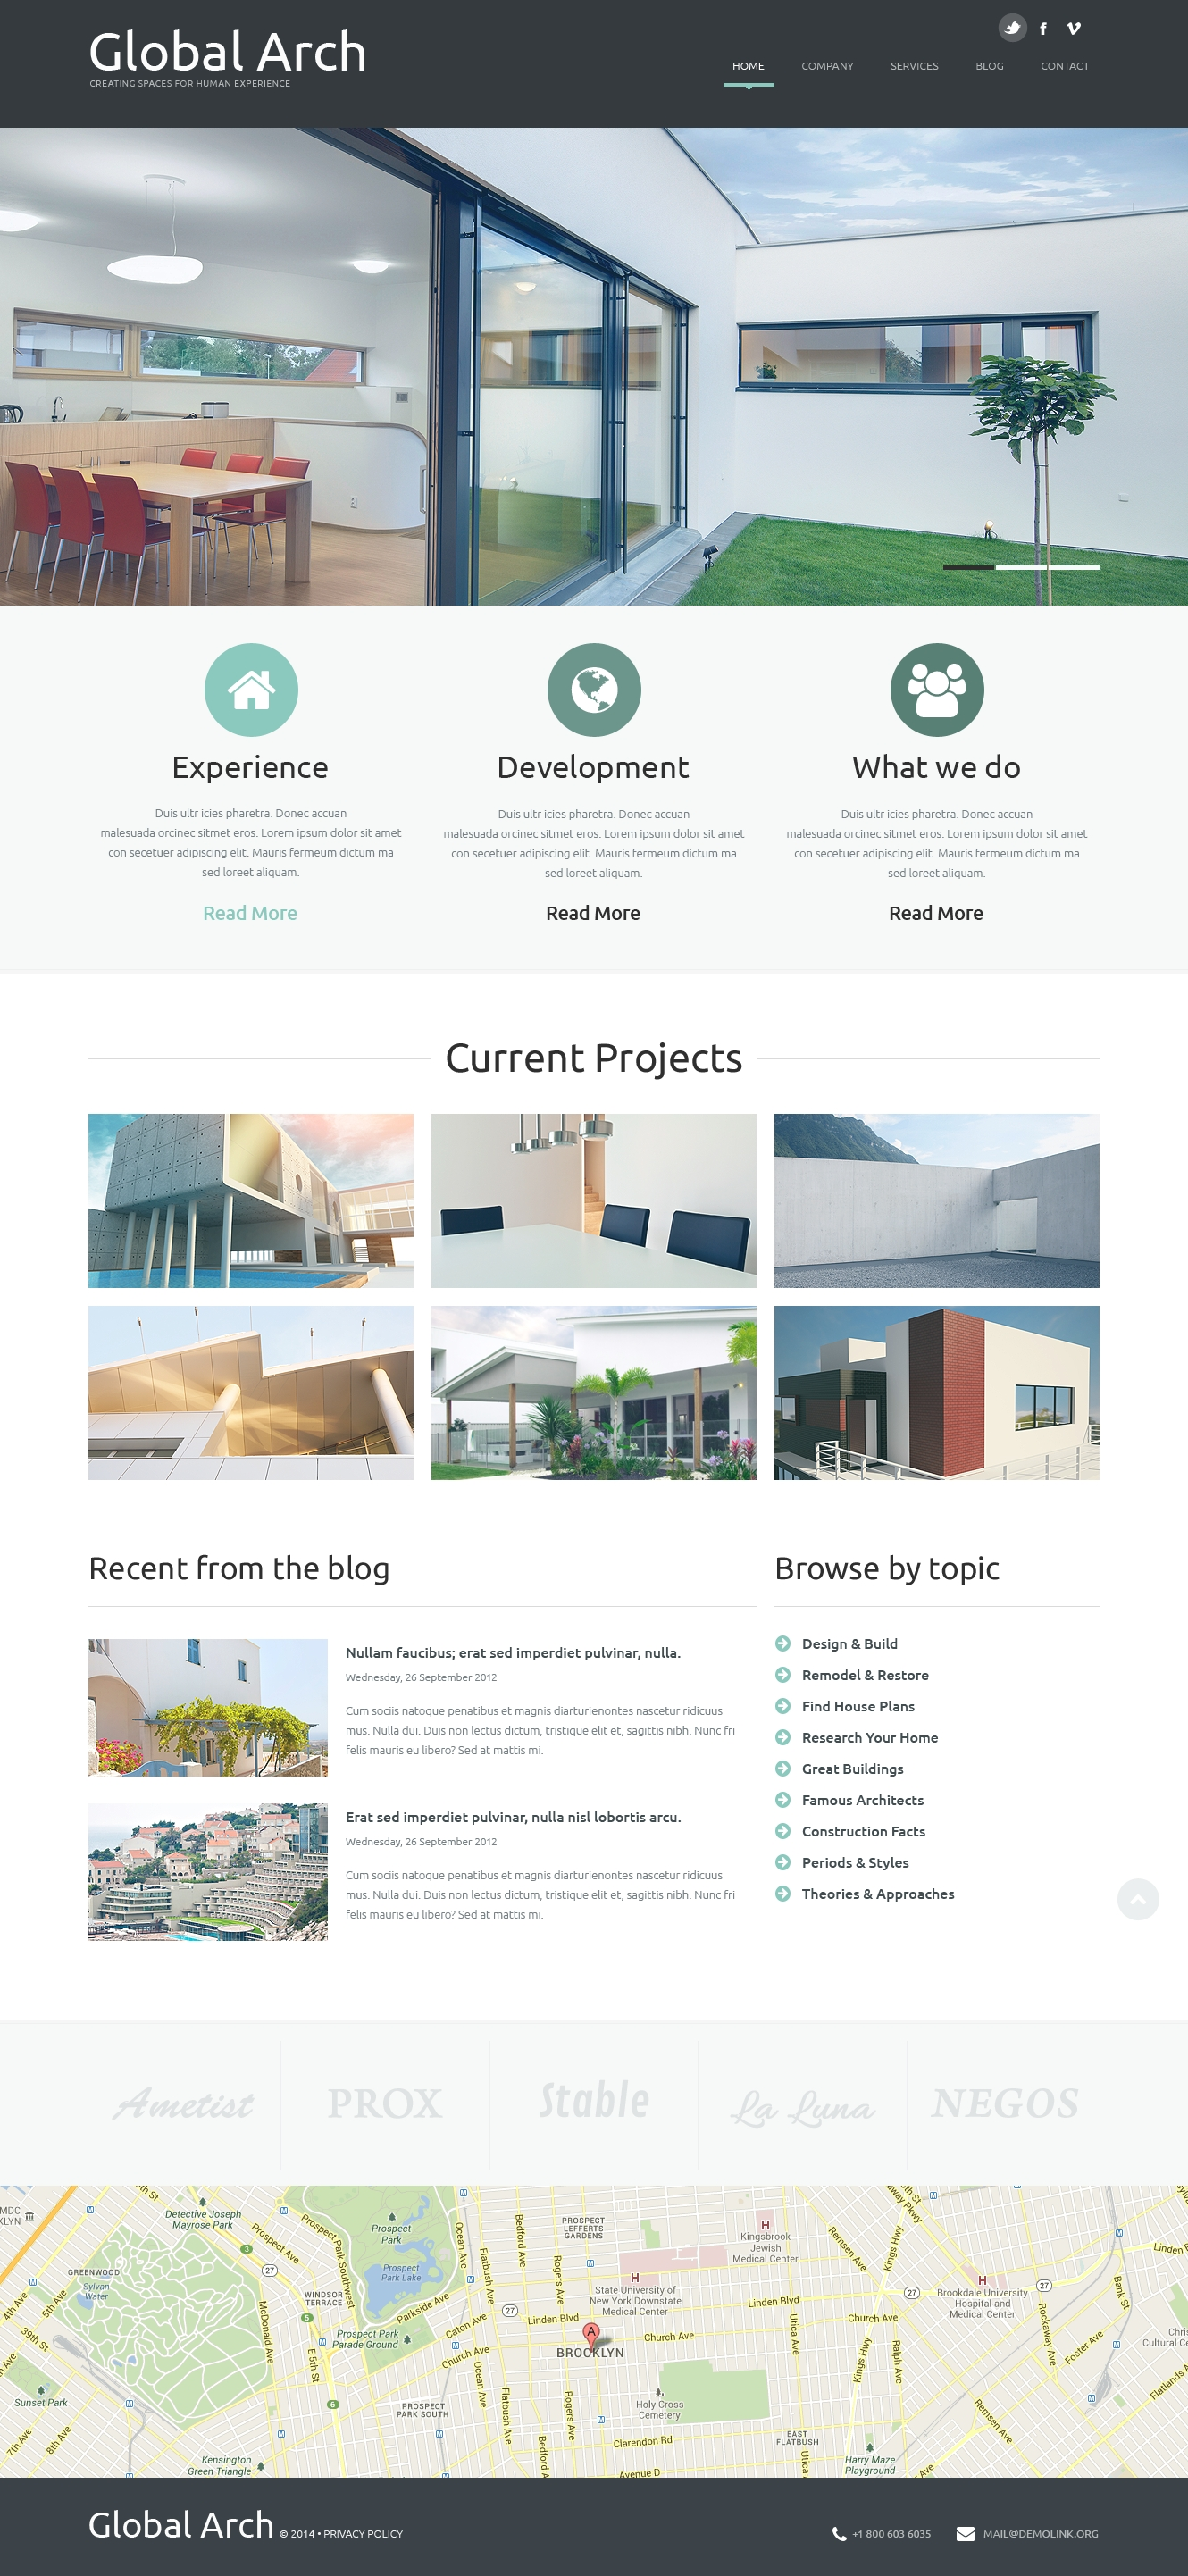 Plantilla Joomla Responsive para Sitio de Arquitectura #49343 - captura de pantalla